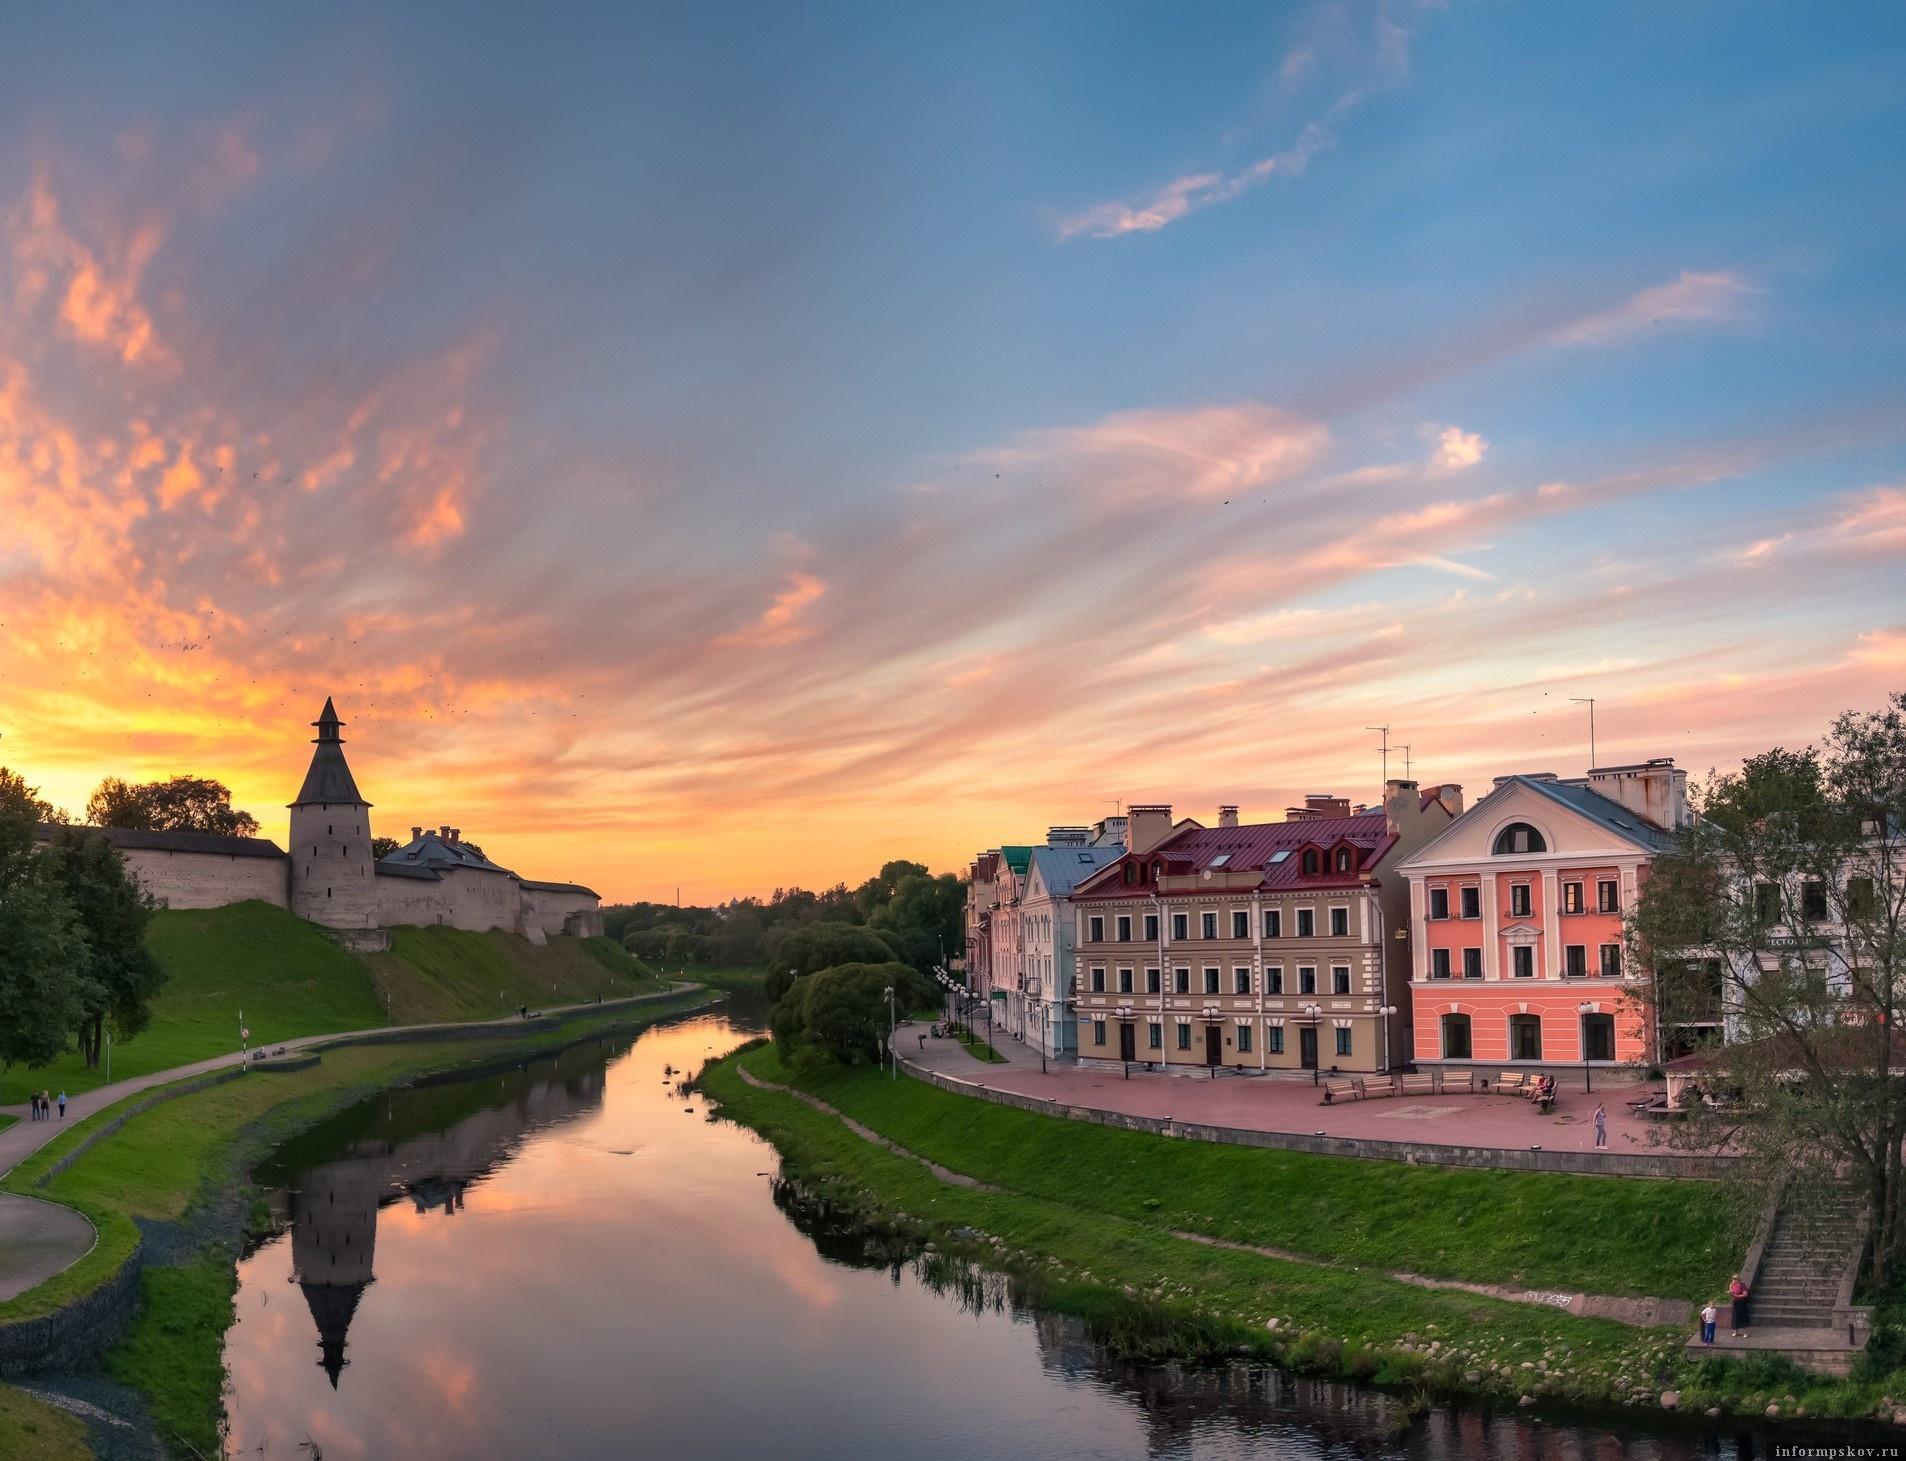 Вид с площадки на Троицком мосту в Пскове. Фото предоставлено ТИЦ Псковской области.